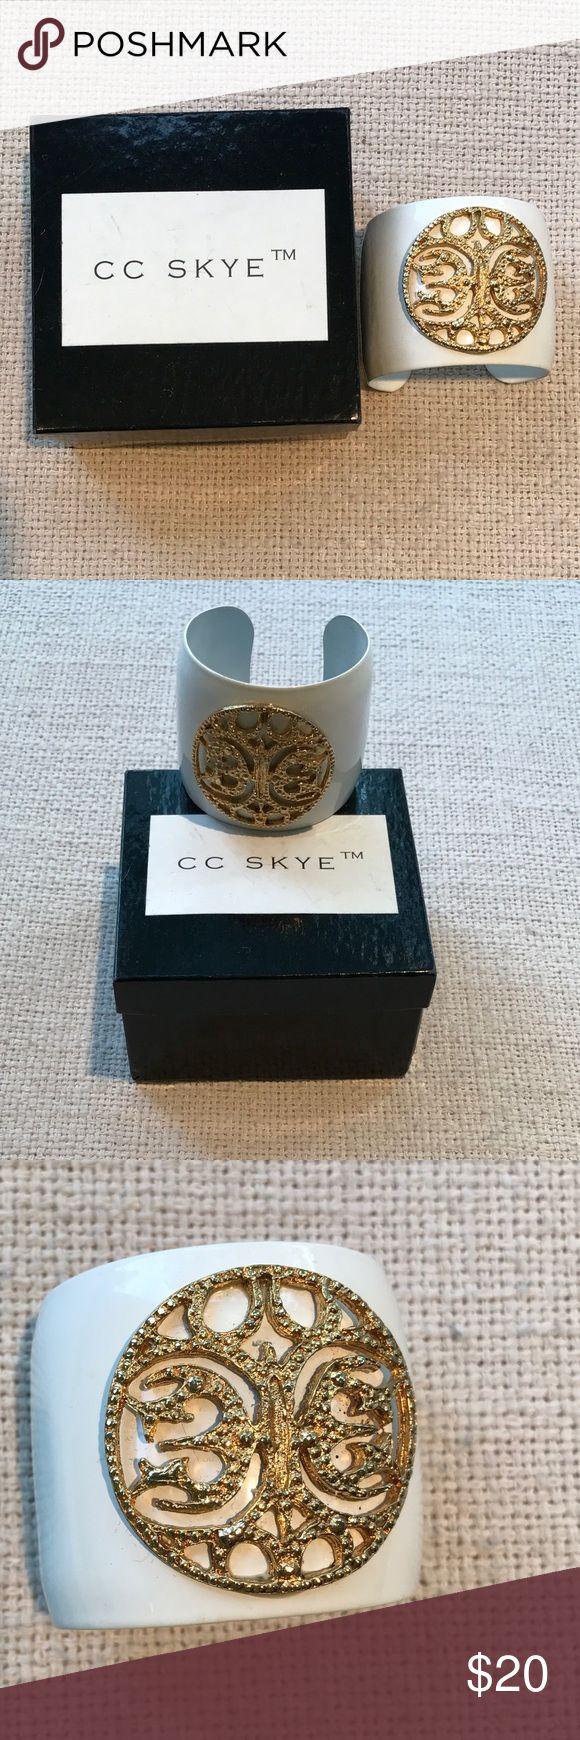 CC Skye white enamel cuff w/gold medallion Beautiful white enamel cuff with gold medallion. Made by CC SKYE. With box. So pretty for summer!! CC Skye Jewelry Bracelets